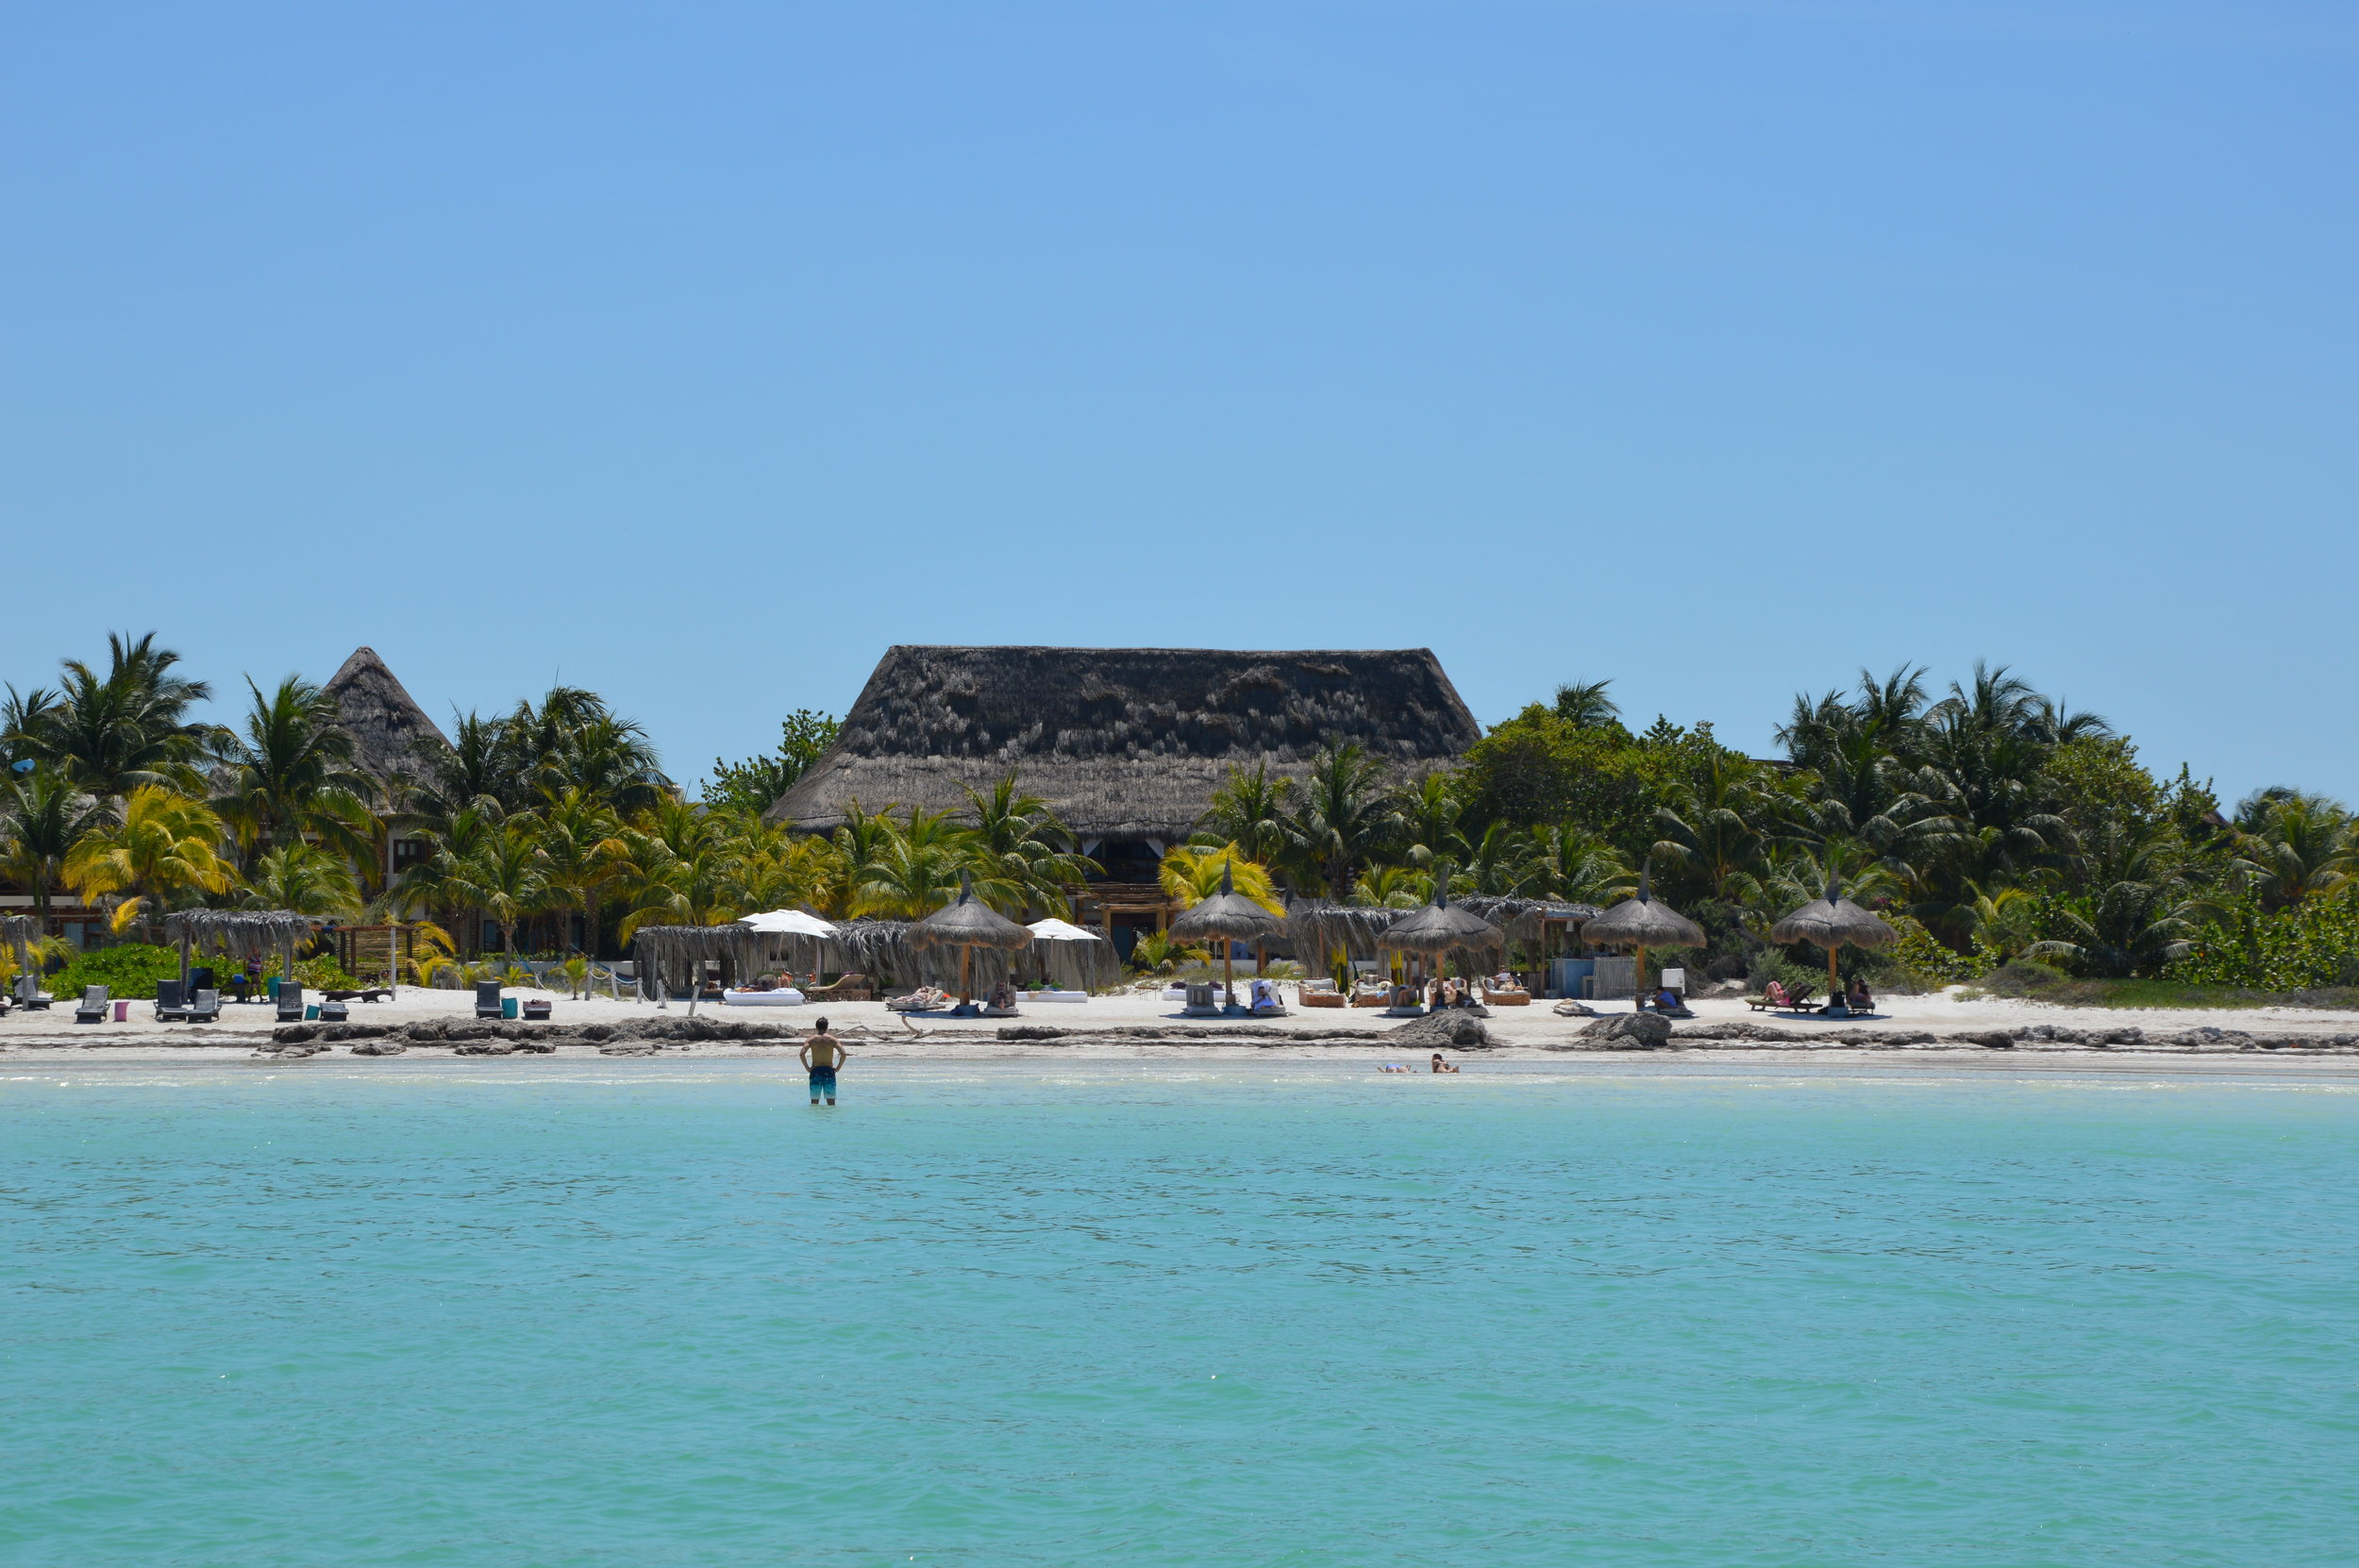 Paraside at the Casa Sandra Holbox on Isla Holbox